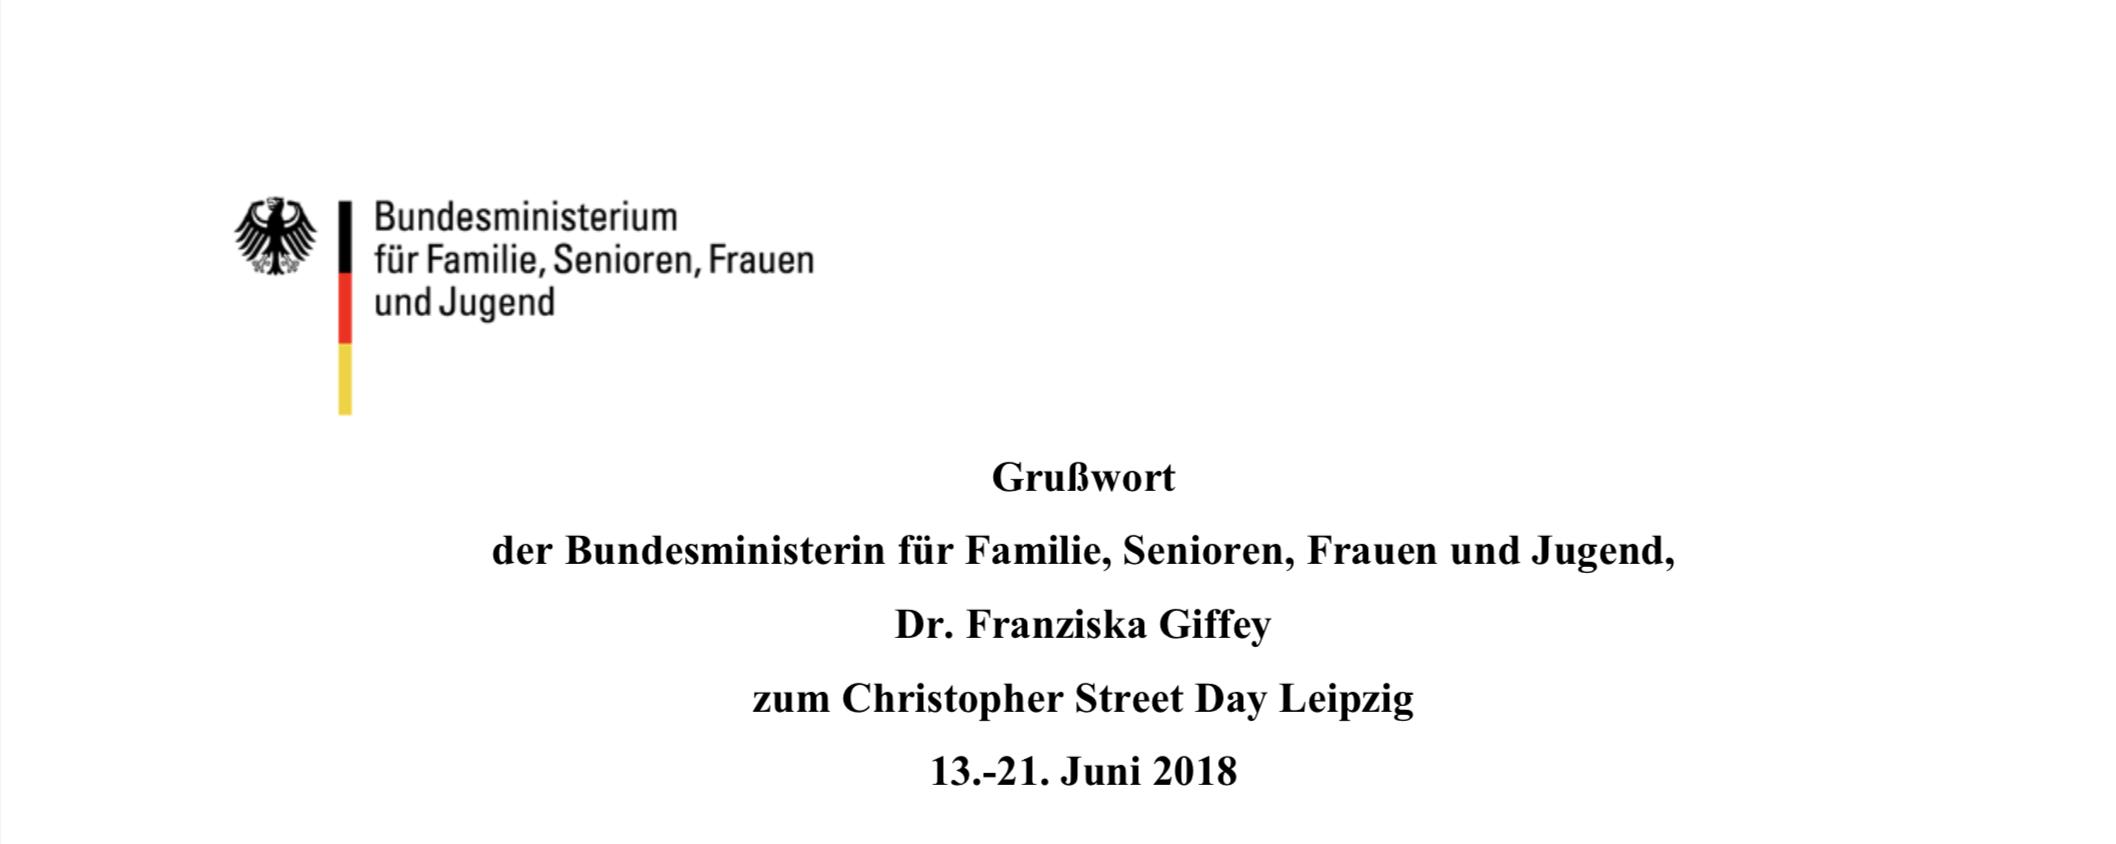 Grußwort Dr. Franziska Giffey